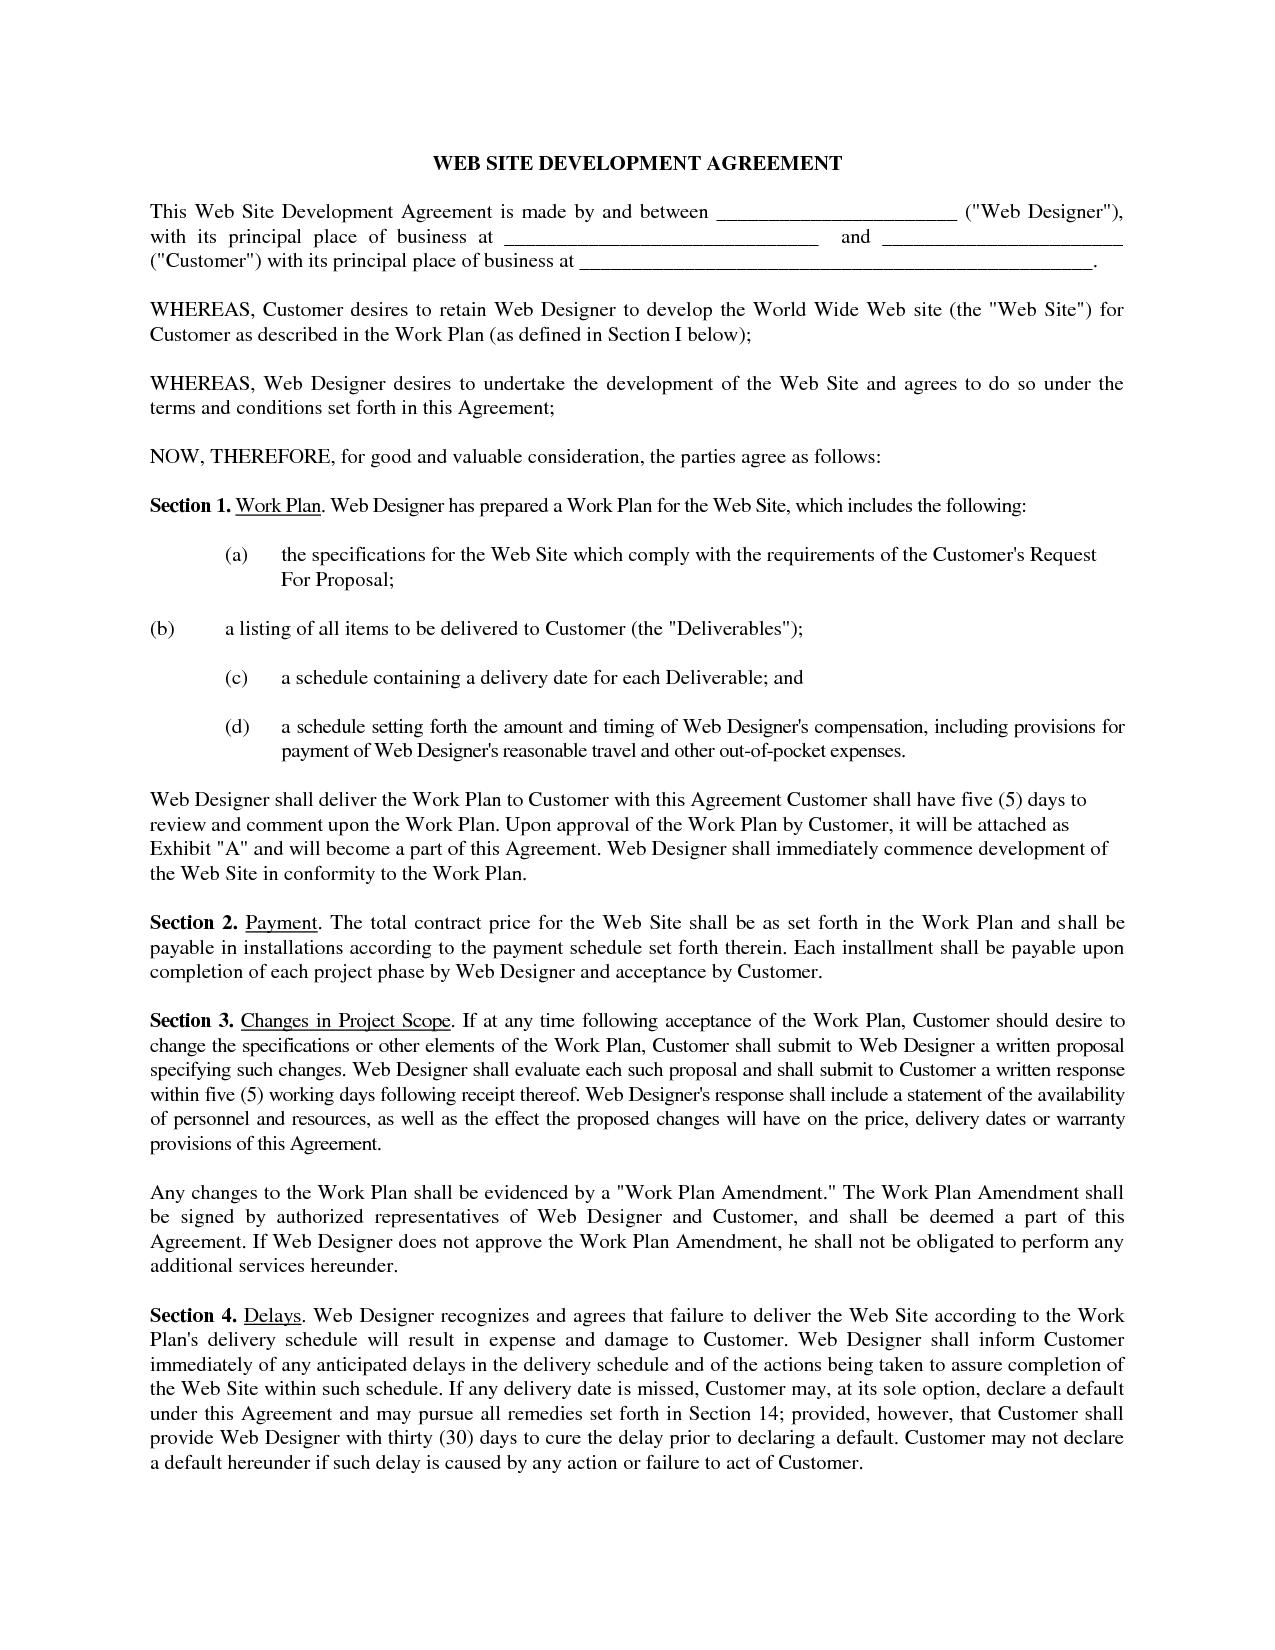 Web Development Contract by fathatdesign - web developer contract ...